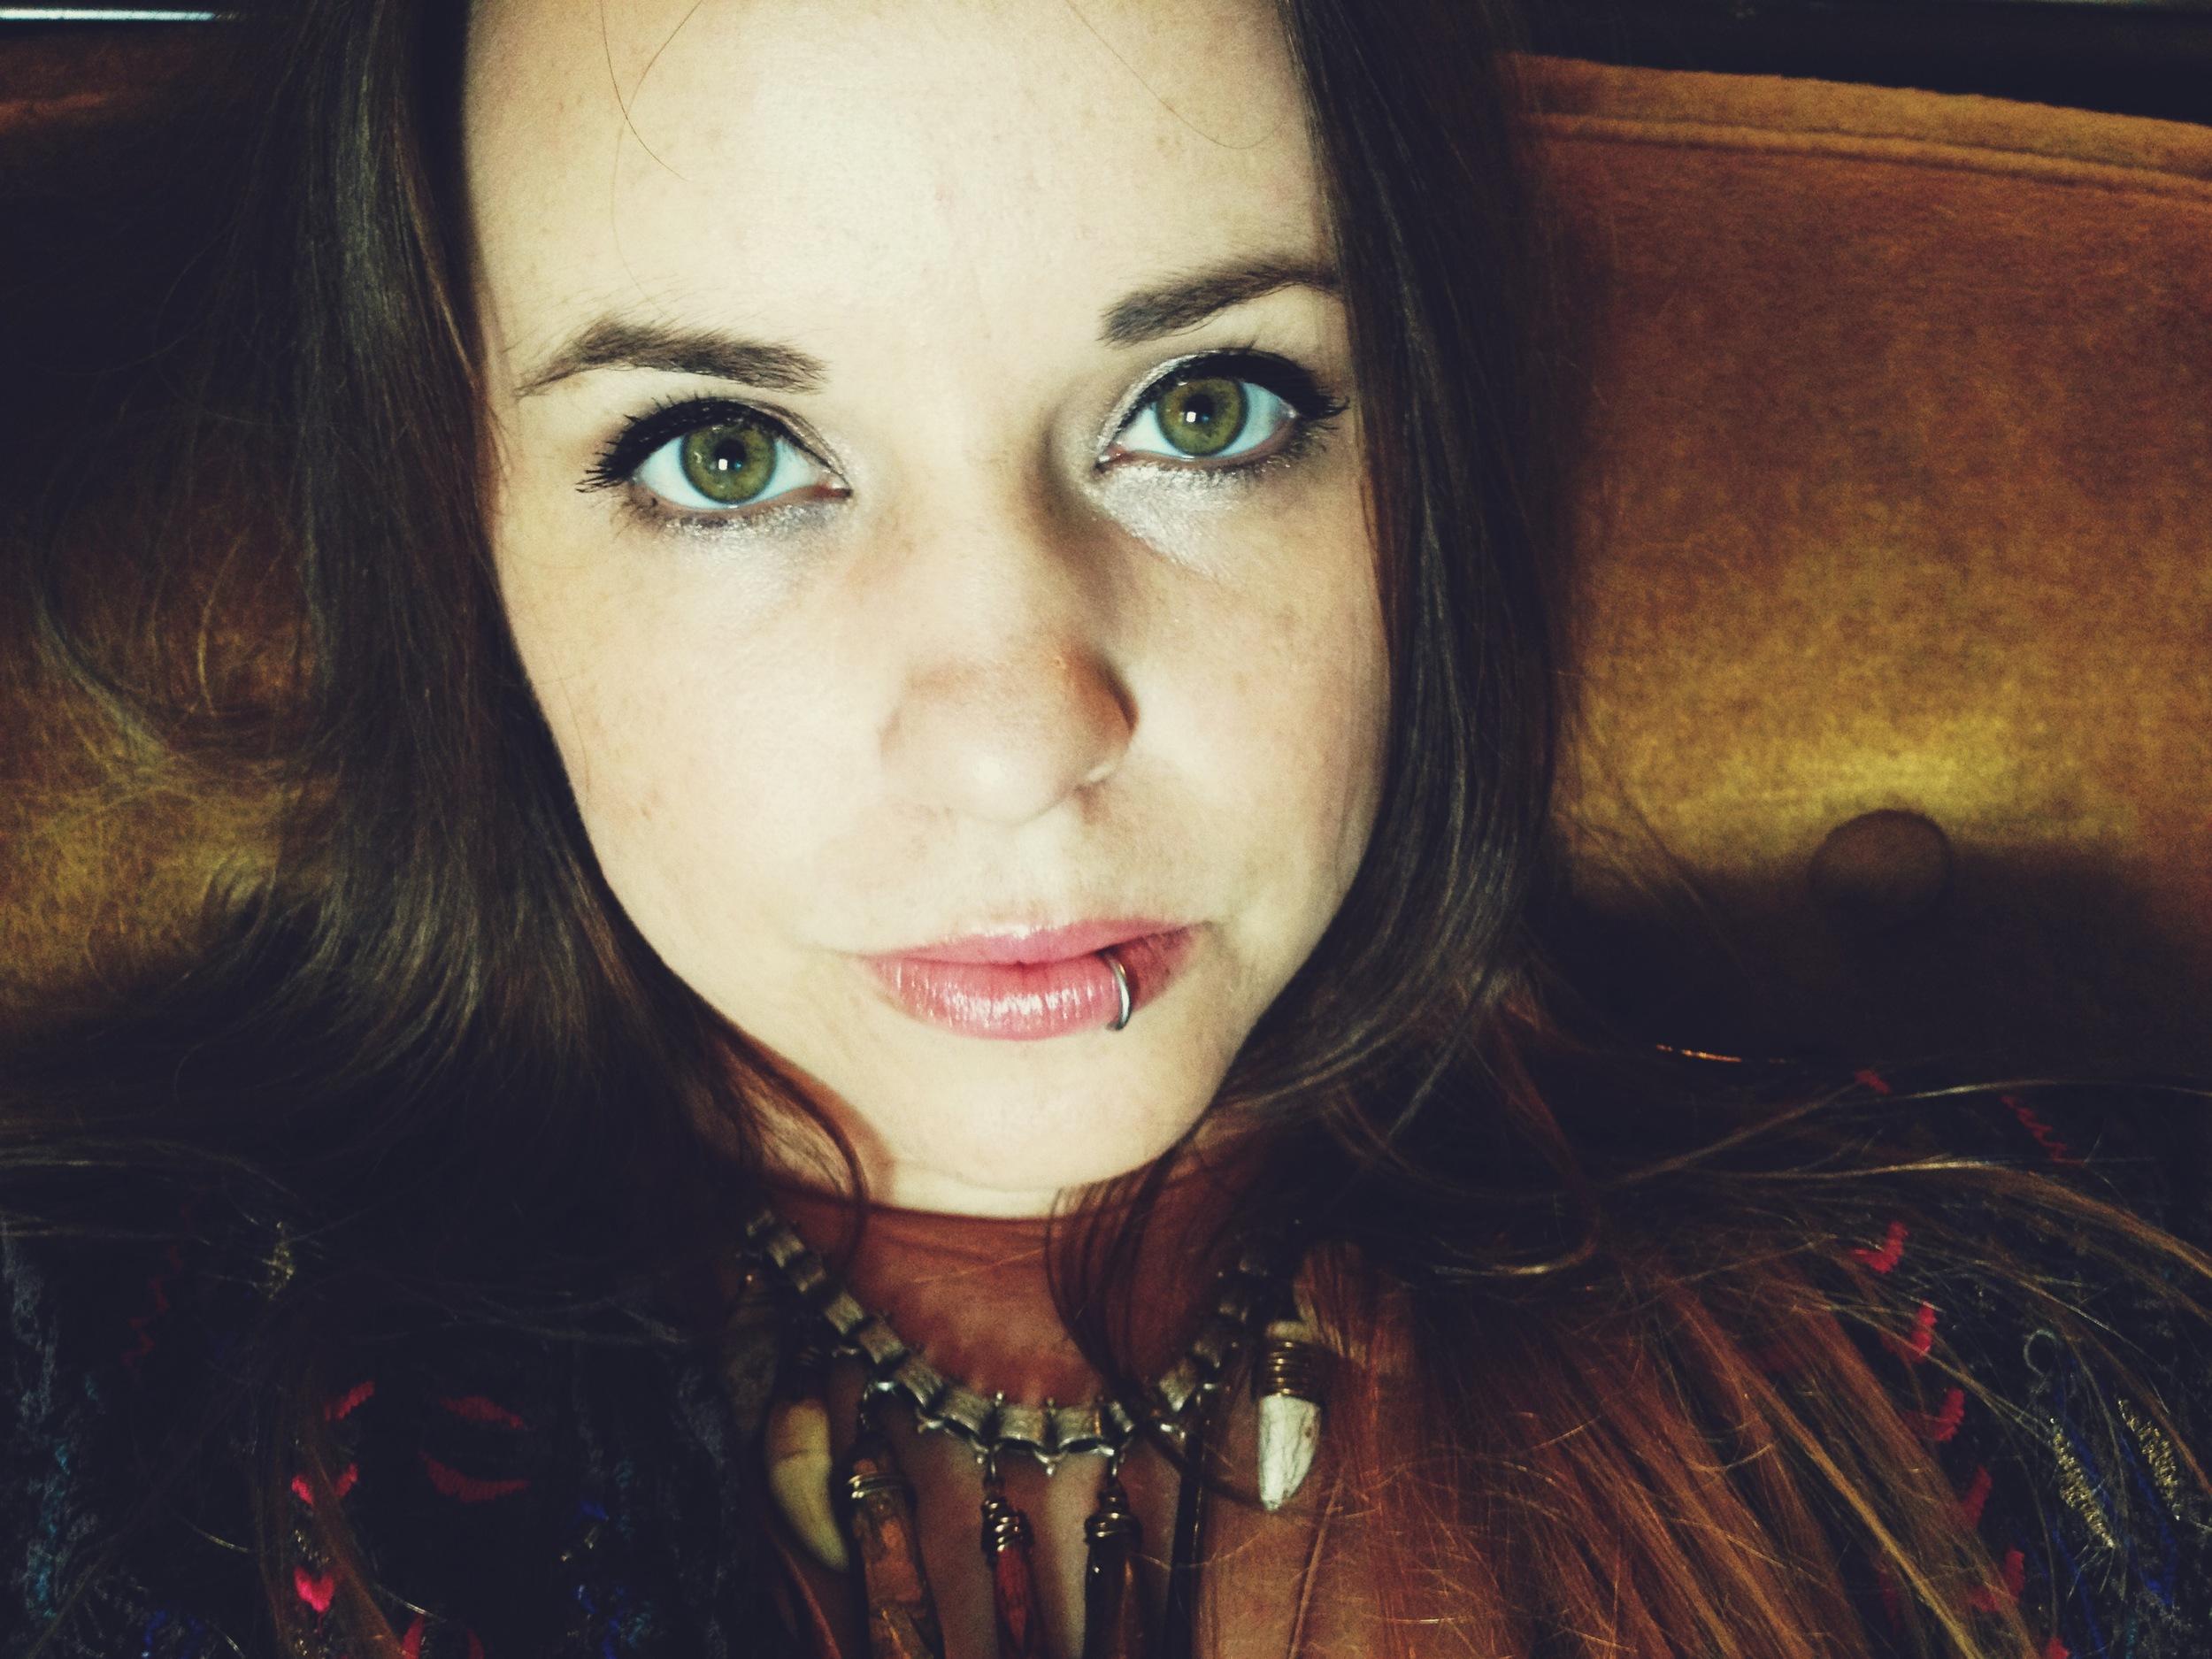 Laura Mazurek